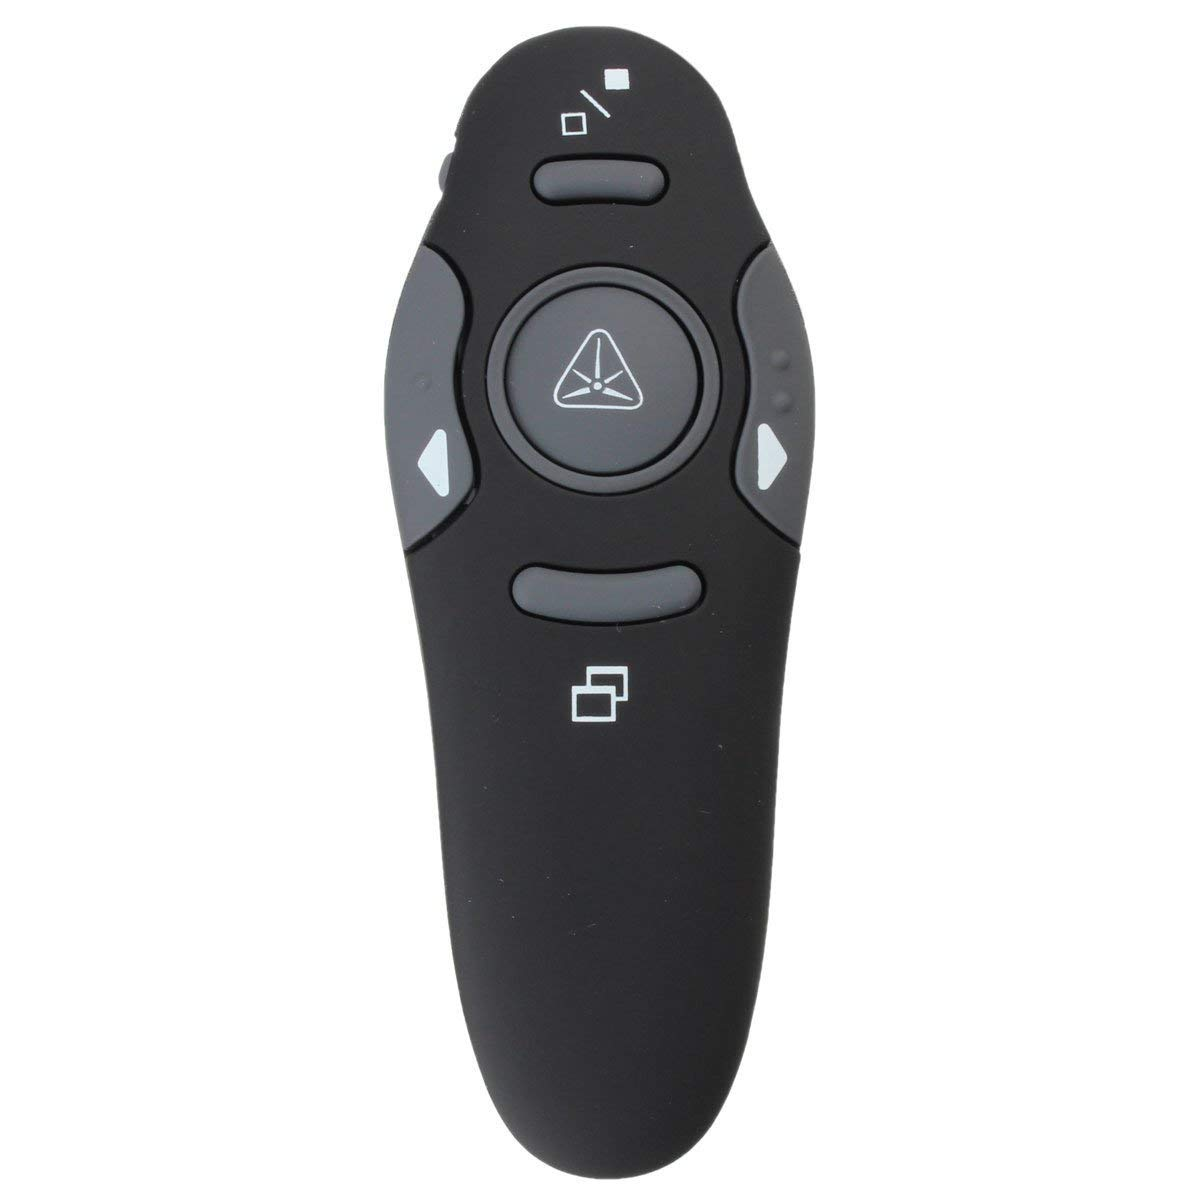 2.4GHz Wireless Remote Control Presenter Presentation USB Laser Pointer Pen Receiver - Mini Keyboard & Remote Mini Keyboard - 1 x 2.4GHz Wireless Presenter Pointer Pen